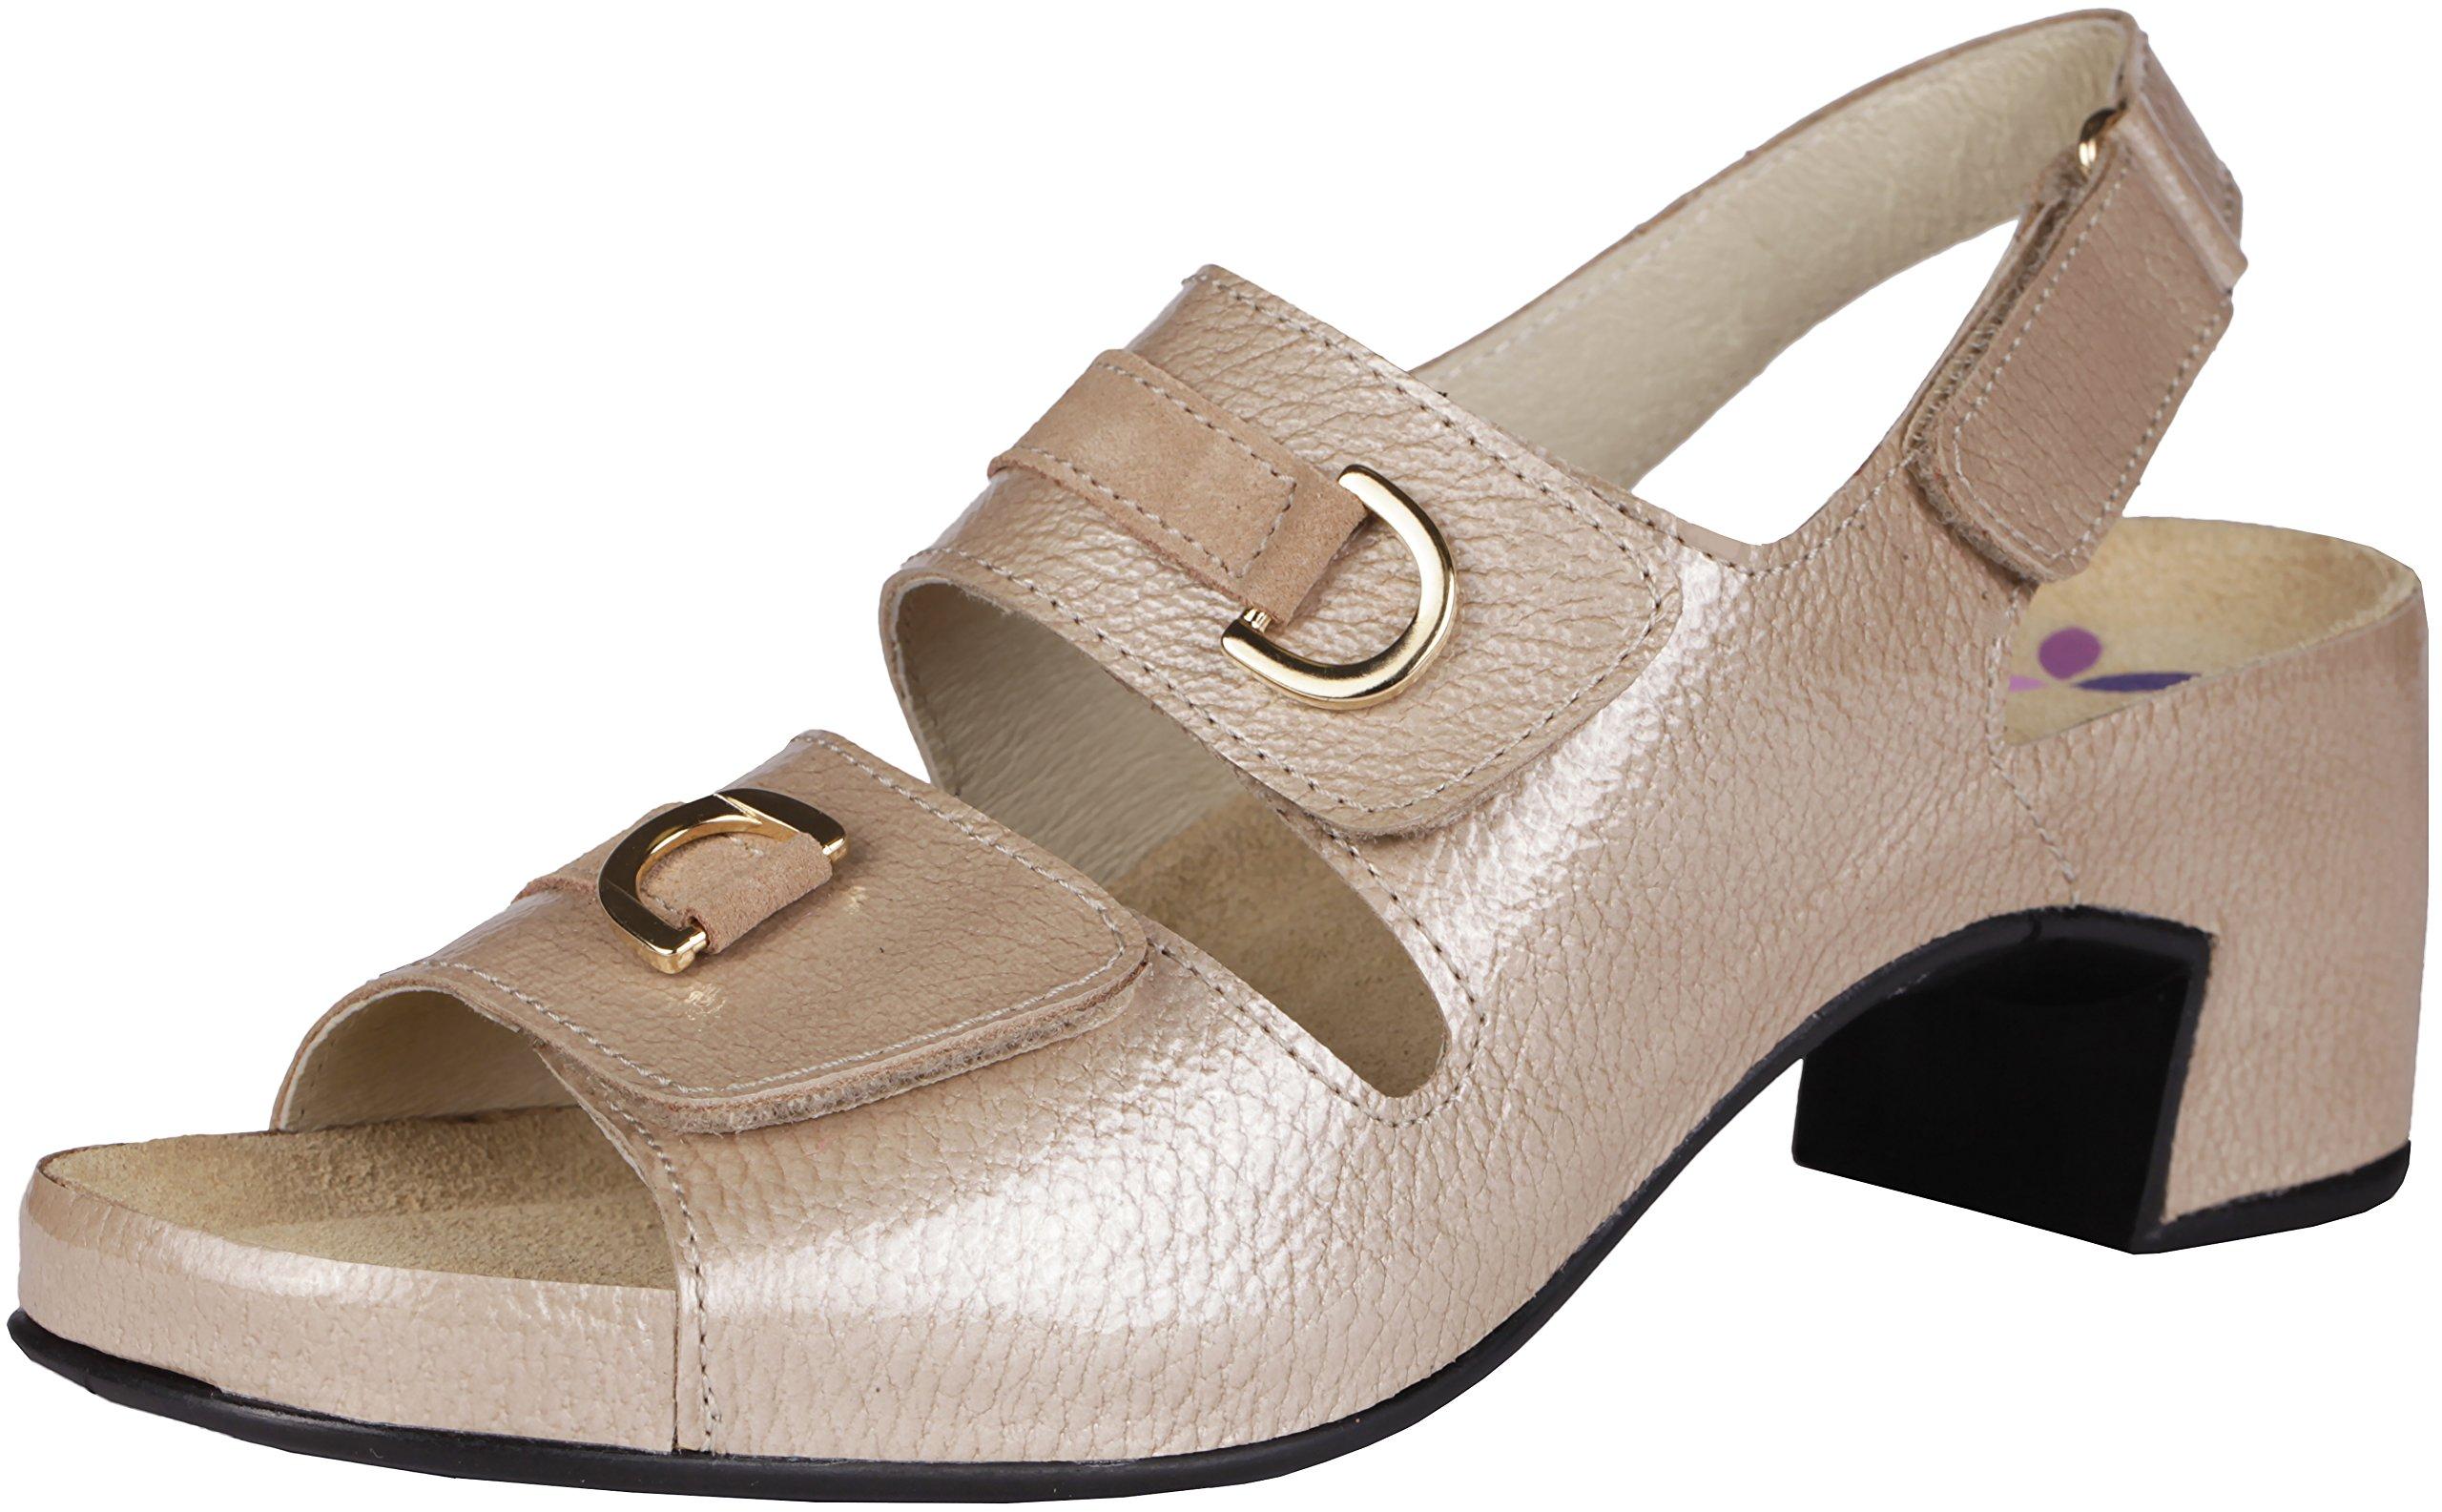 Helle Fashion Comfort Women's danai Beige 2 Velcro Slingback Sandal Size 38